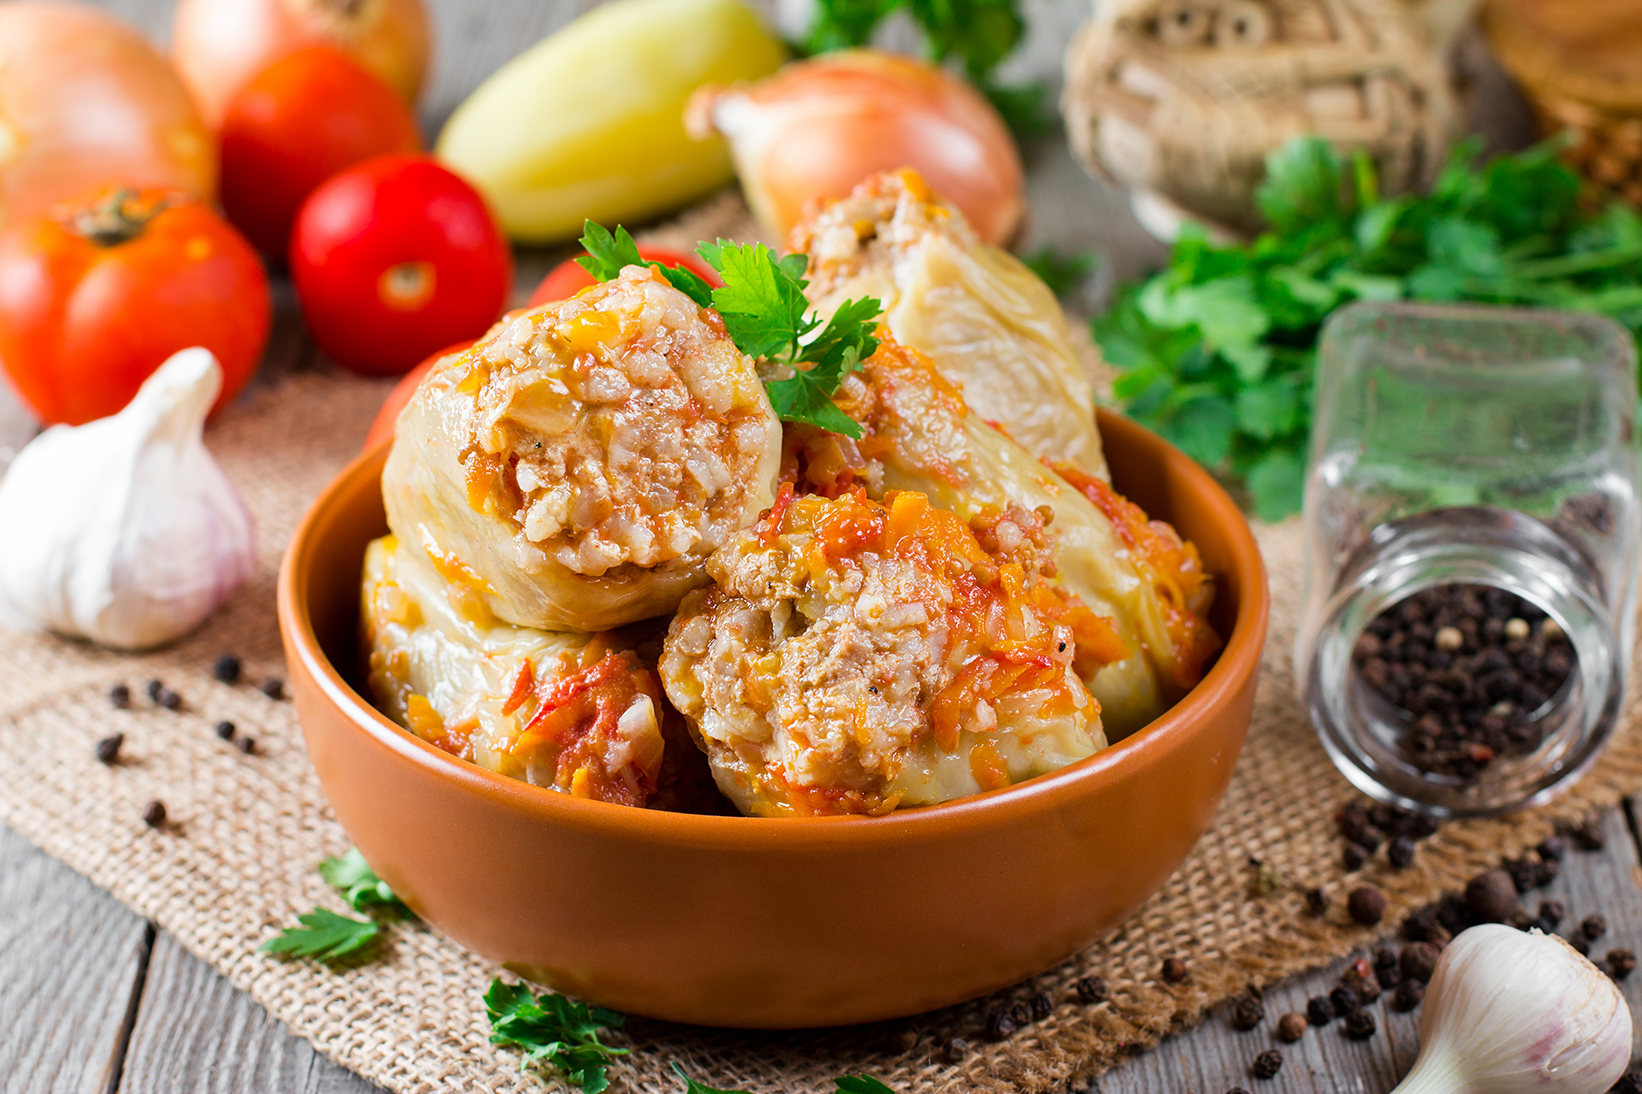 фаршированный перец рецепт для заморозки